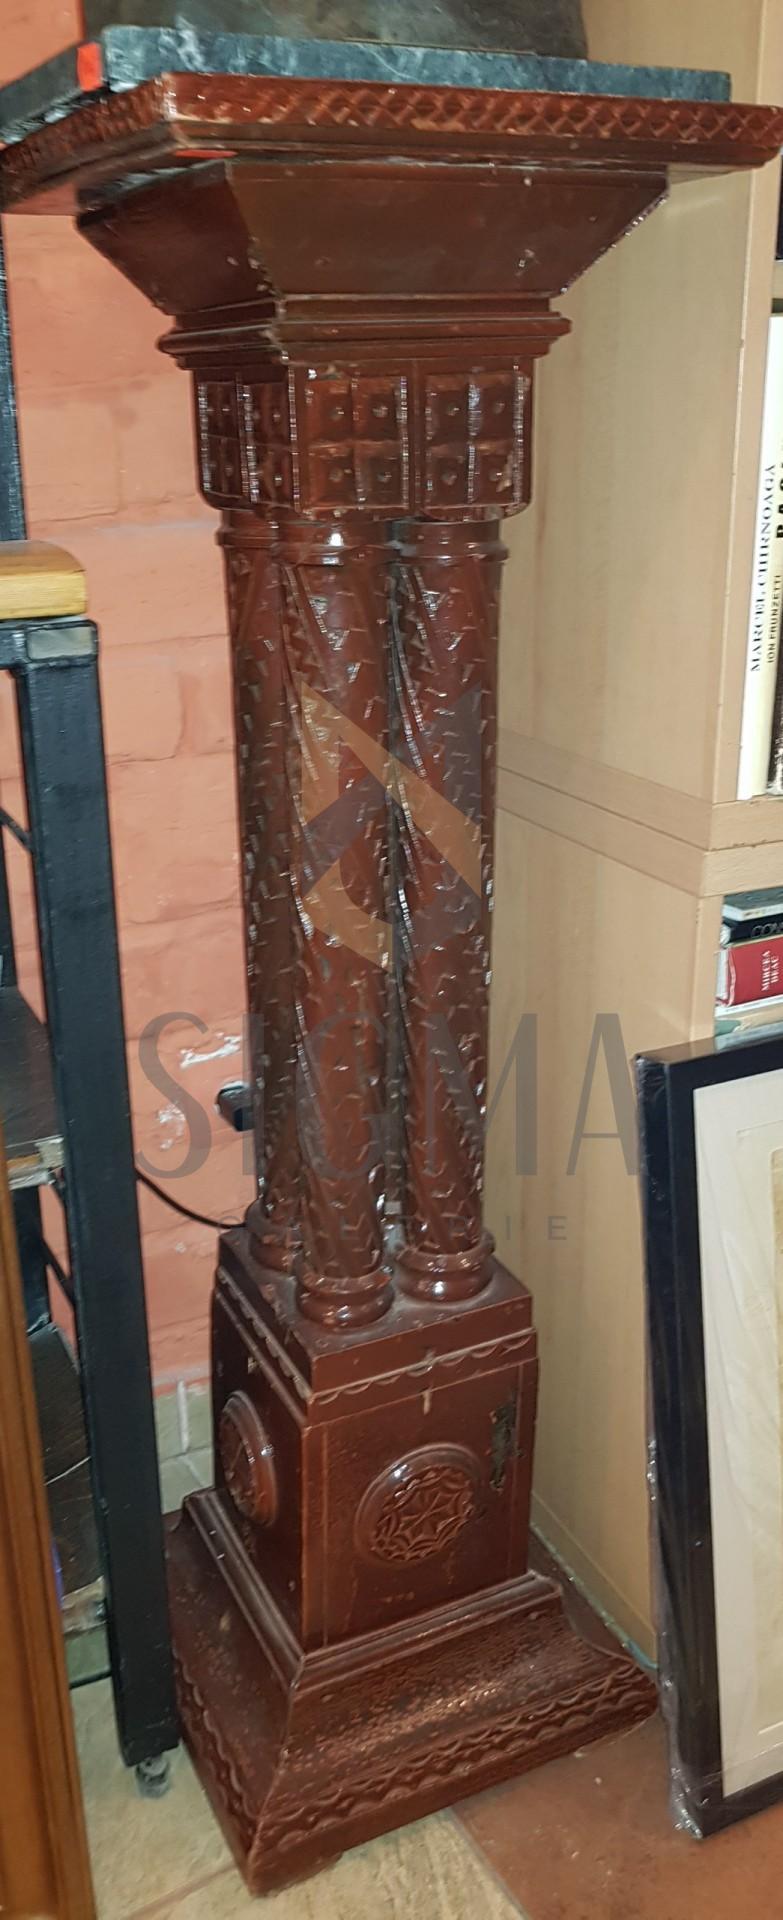 "PIEDESTAL din LEMN, Sculptat In Stil ""NEOBRANCOVENESC"", H = 104cm."